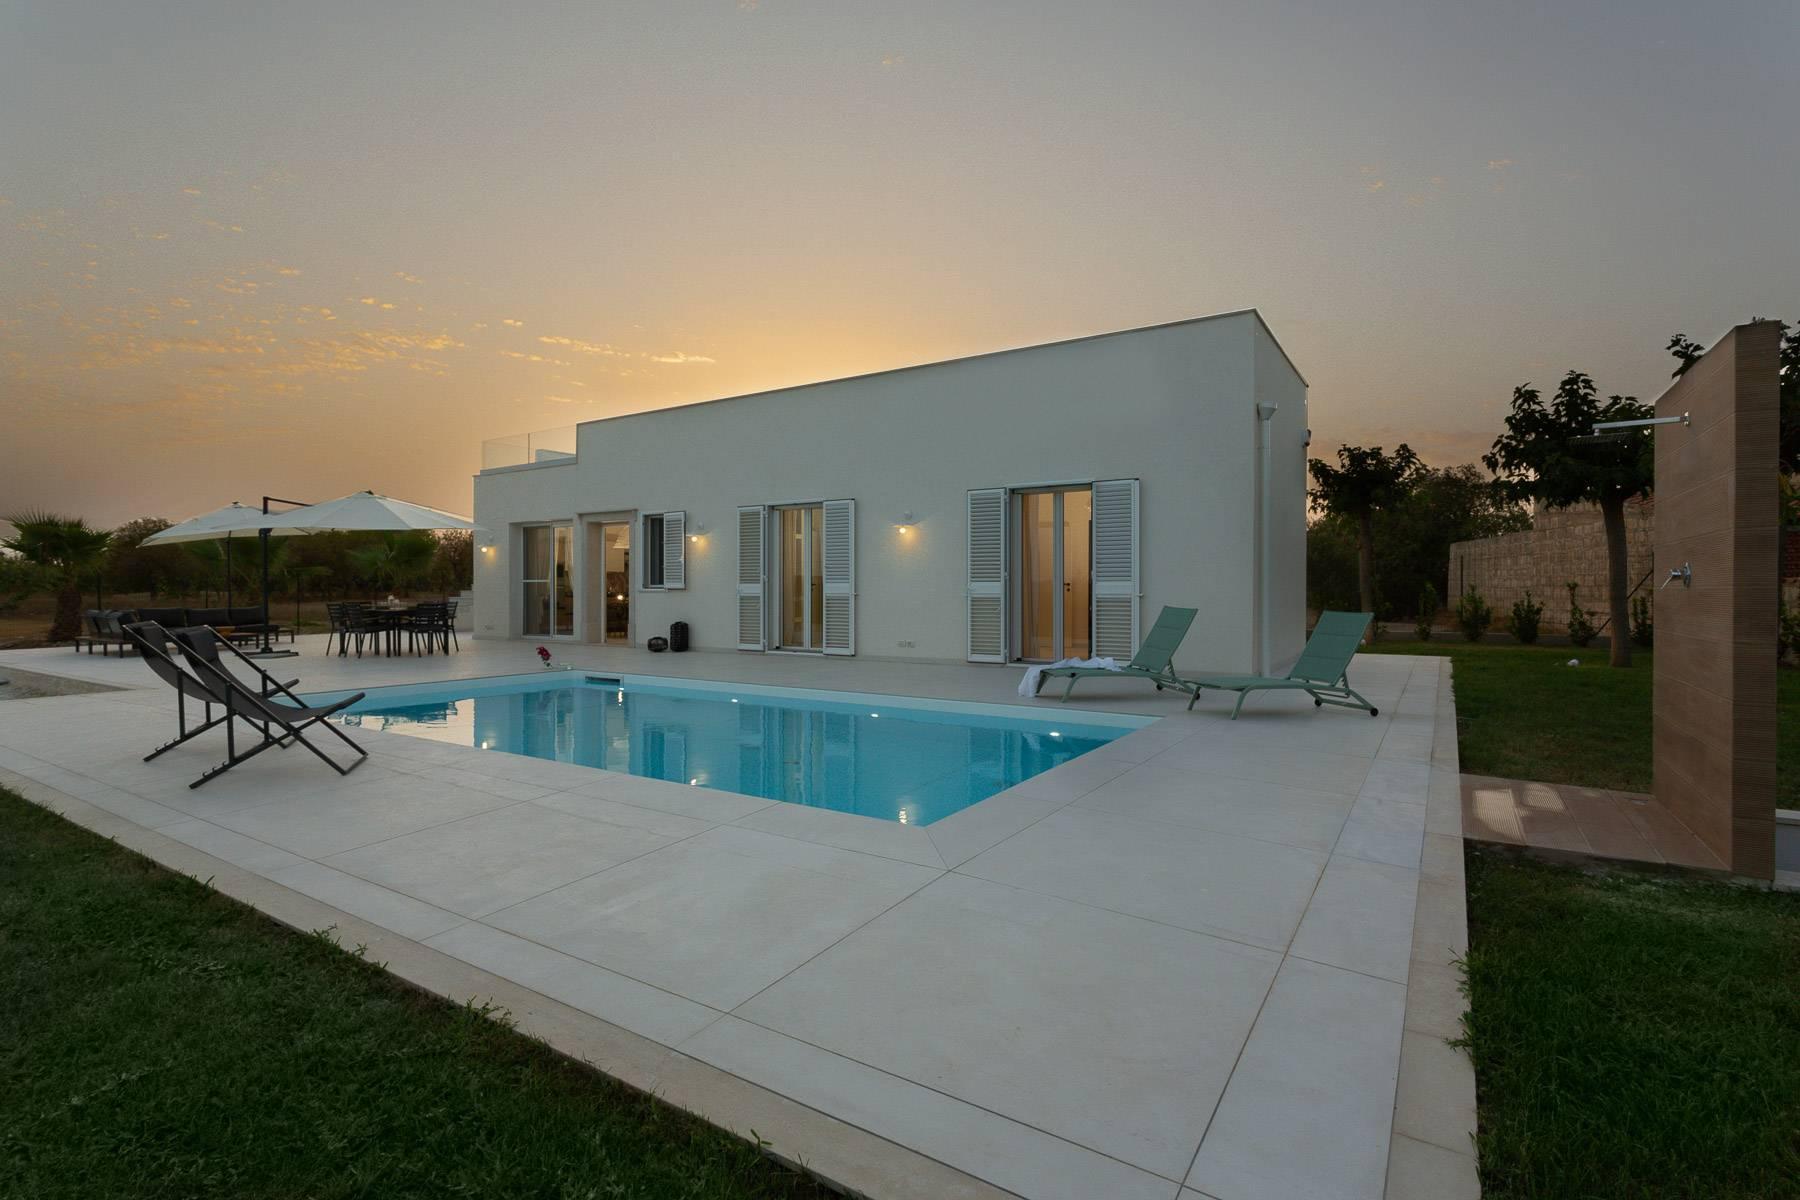 Villino con piscina a San Lorenzo - 1